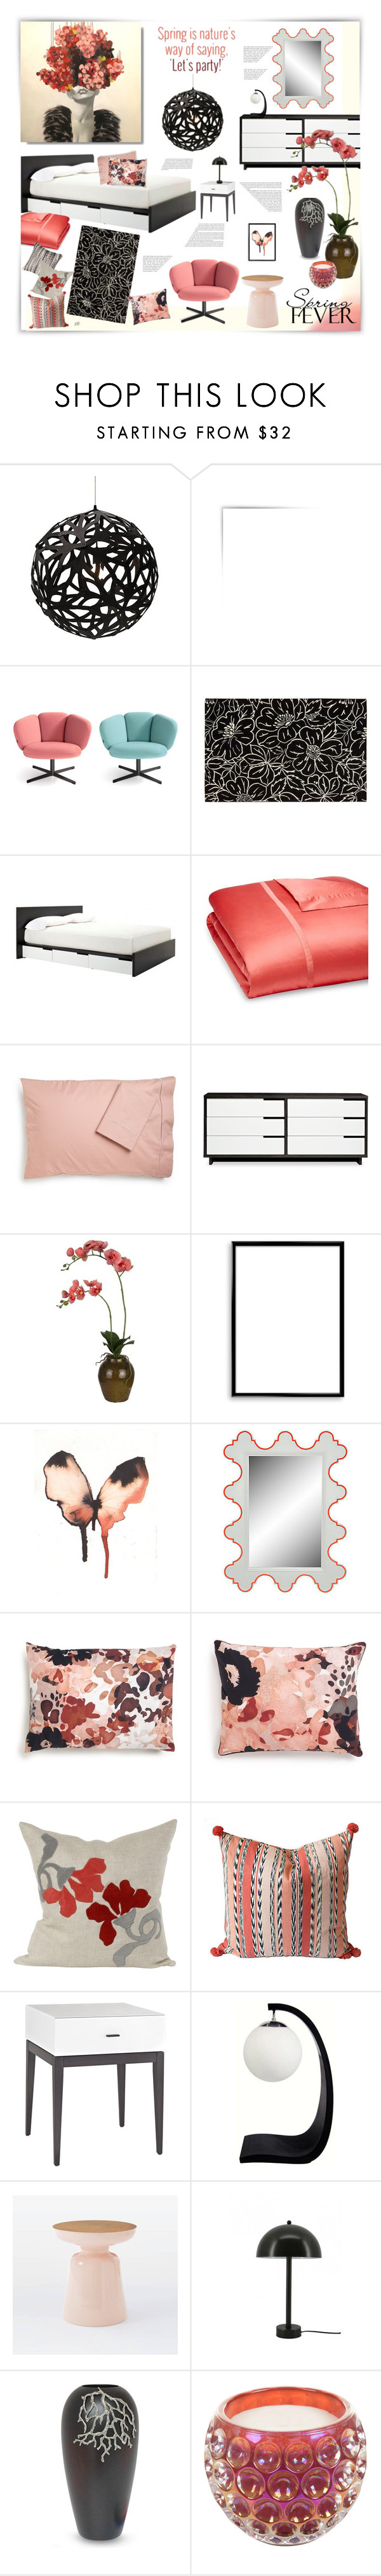 """Untitled #978"" by louise-stuart ❤ liked on Polyvore featuring interior, interiors, interior design, home, home decor, interior decorating, David Trubridge, Blu Dot, Matouk and Sonia Rykiel"